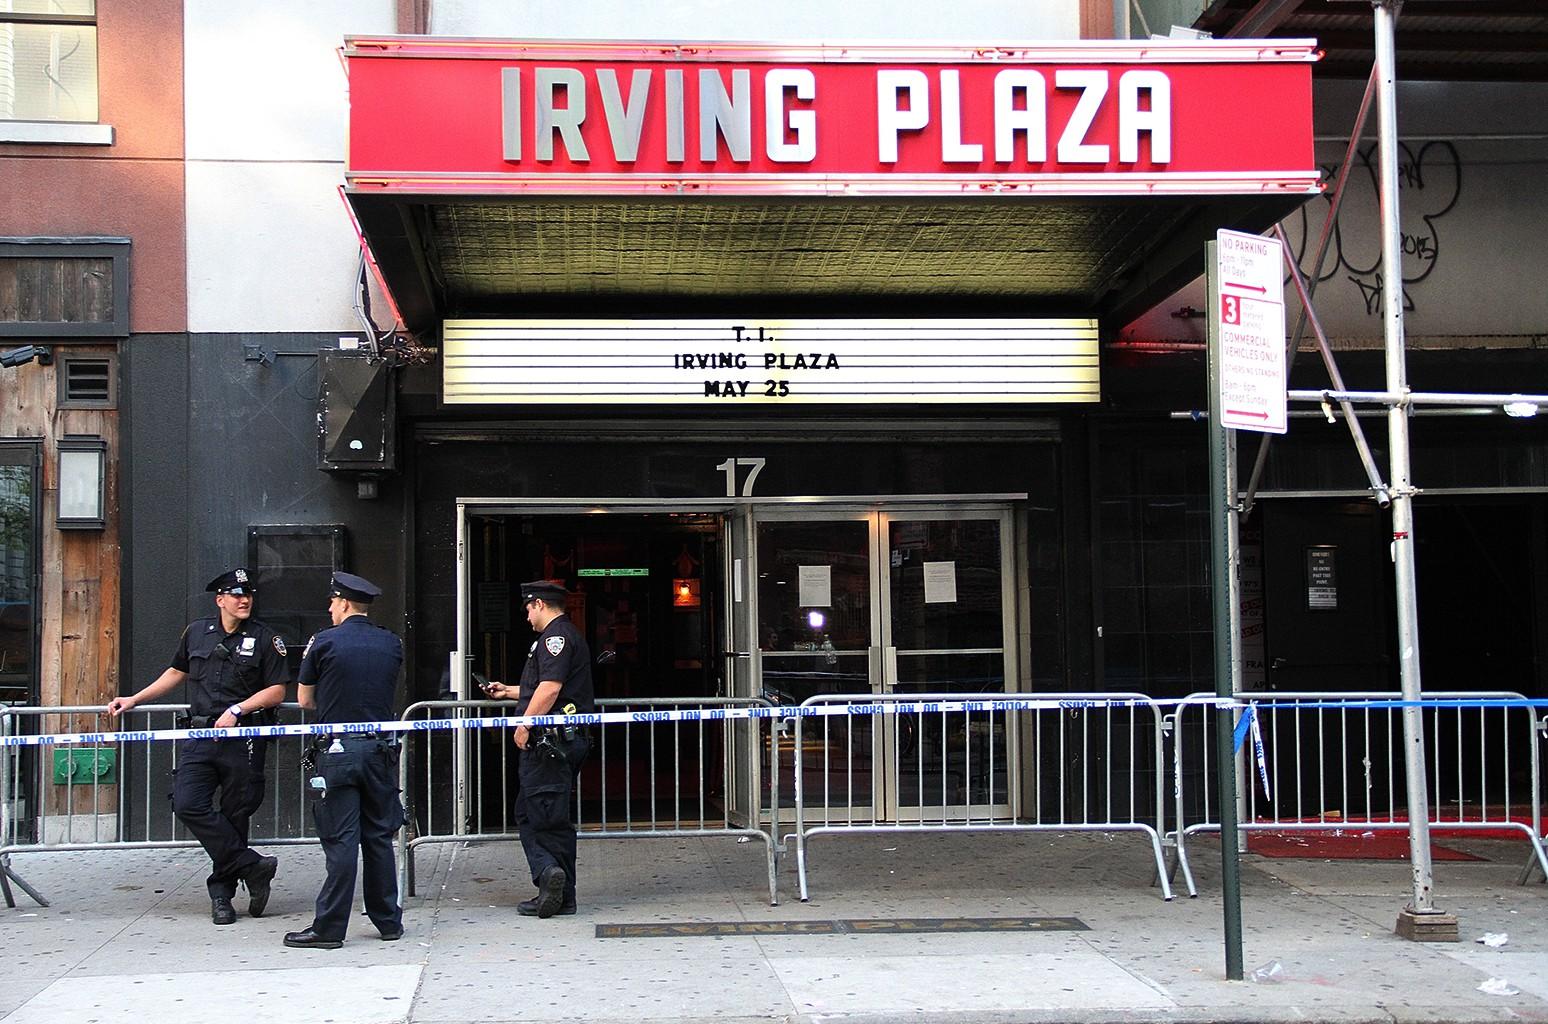 Irving Plaza in New York City